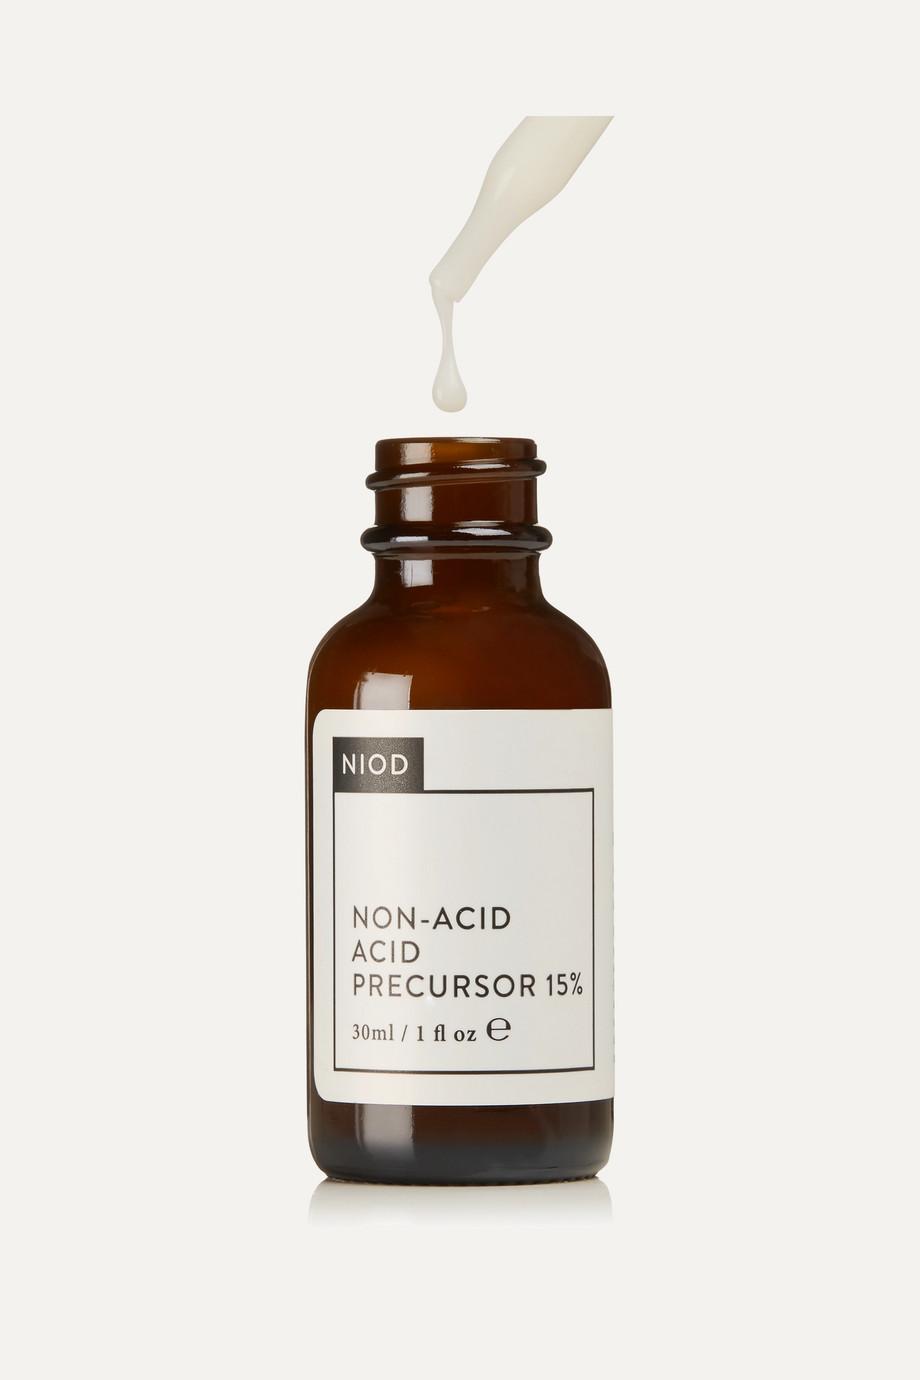 NIOD Non-Acid Acid Precursor 15%, 30 ml – Serum